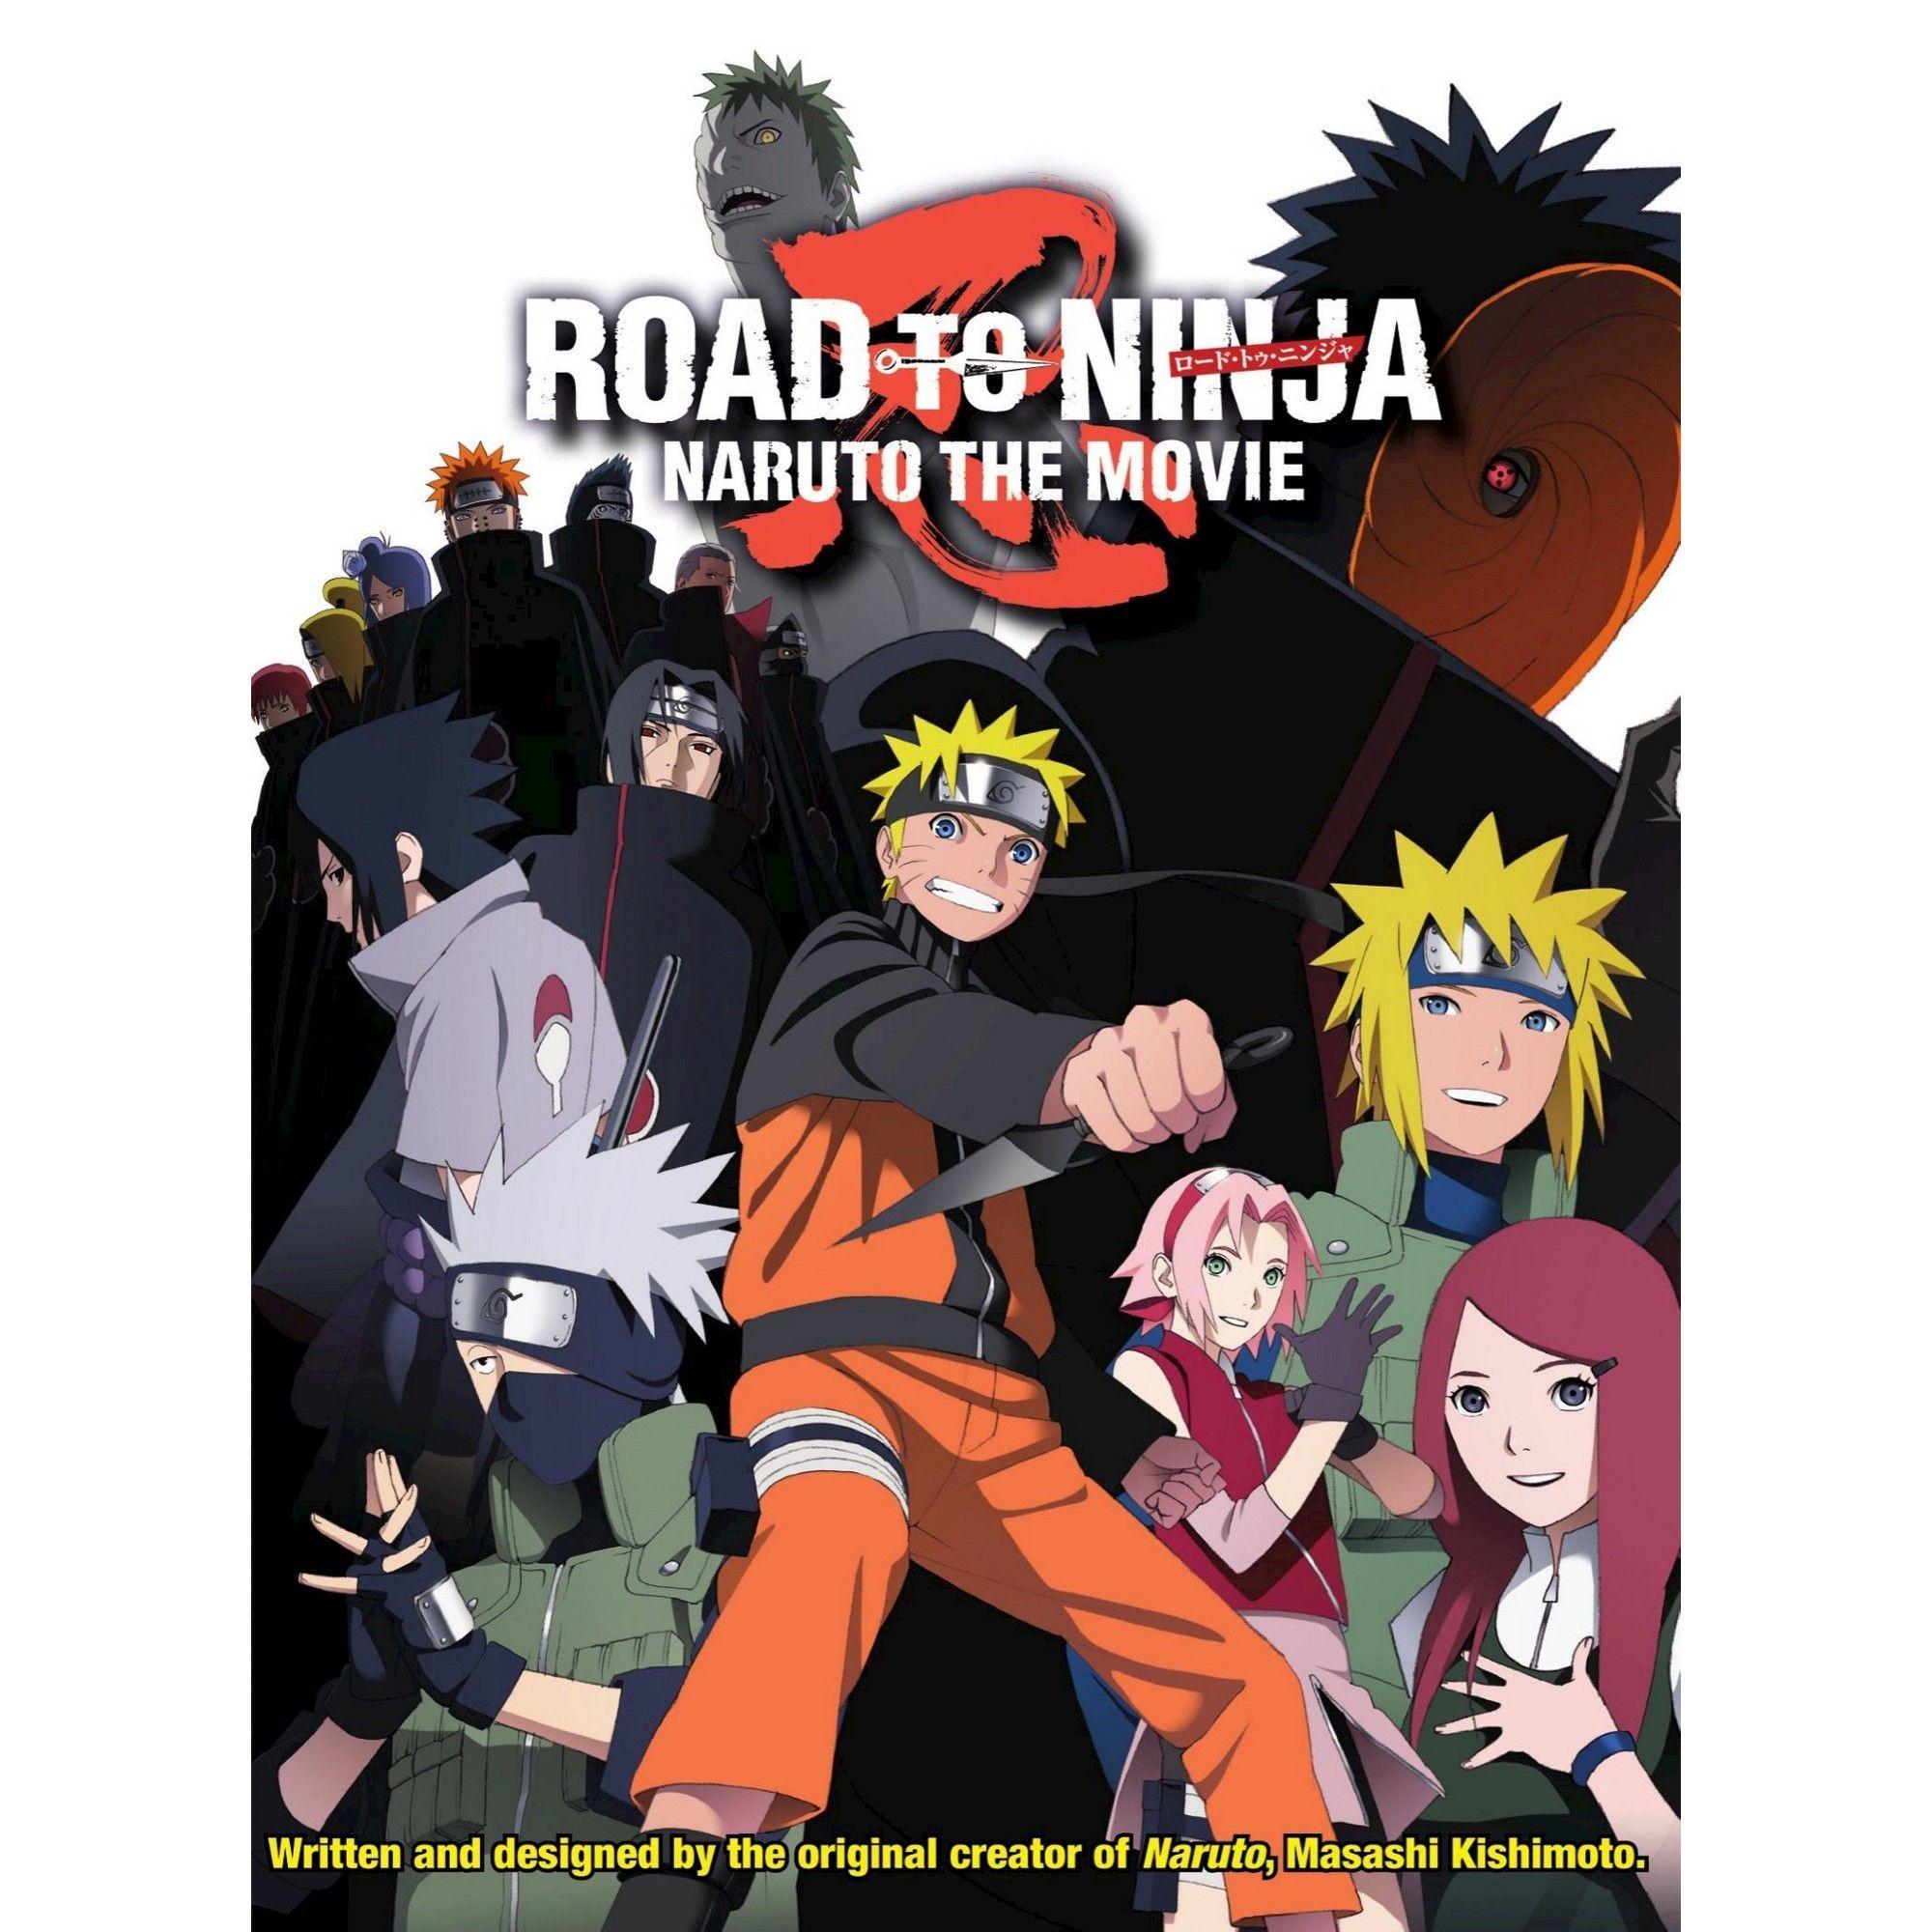 Naruto Shippuden Road To Ninja Movie Dvd Narutoshippuden Ninja Movies Naruto Shippuden The Movie Naruto The Movie